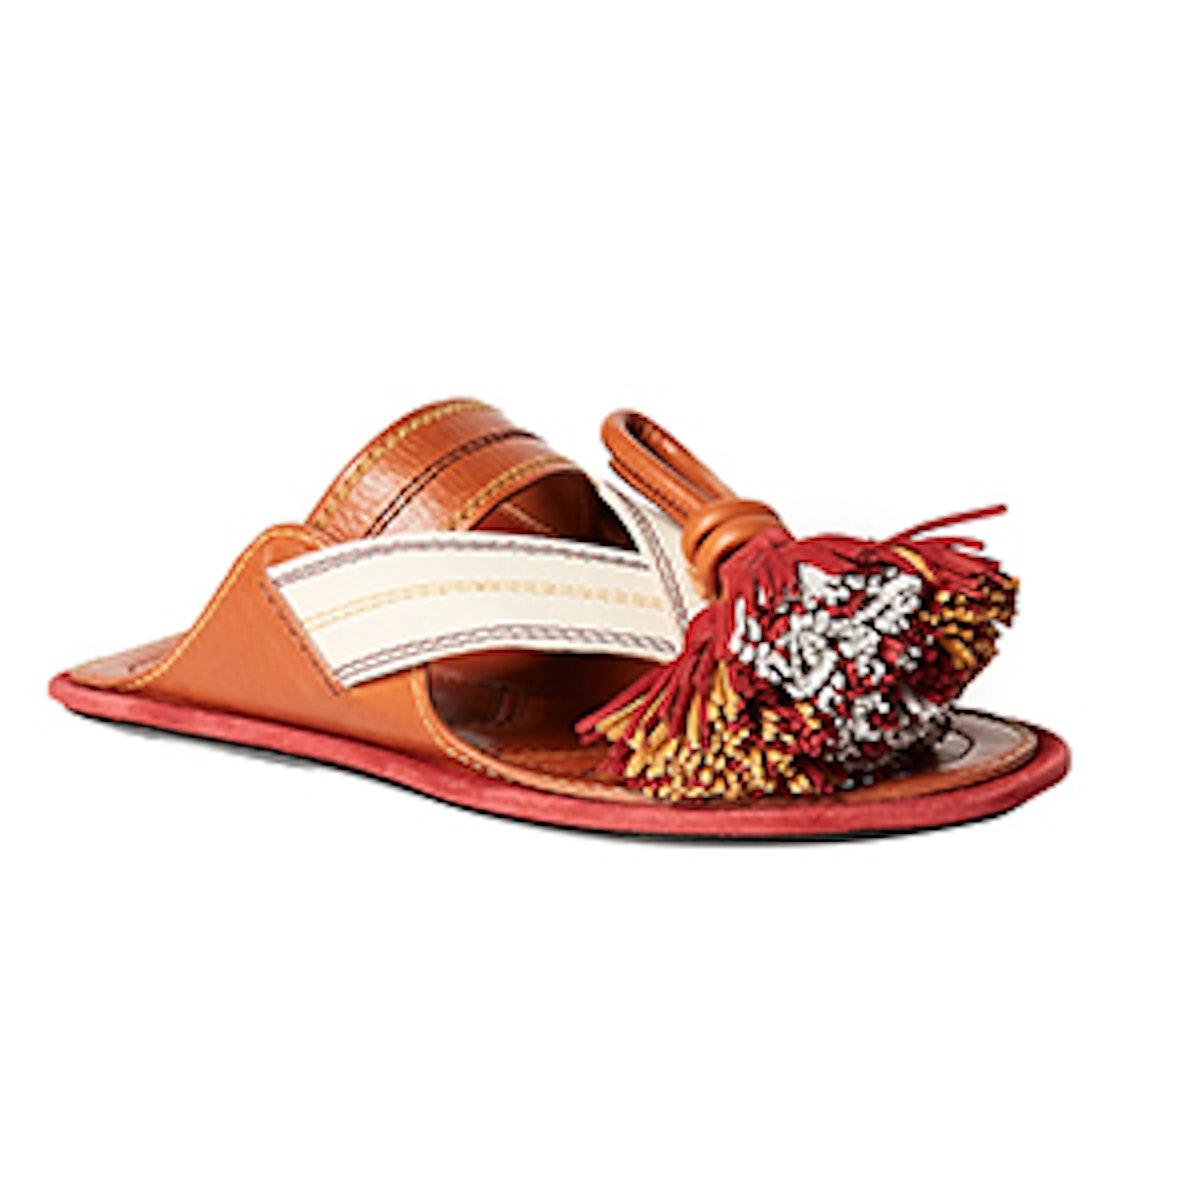 Tassel Sandals